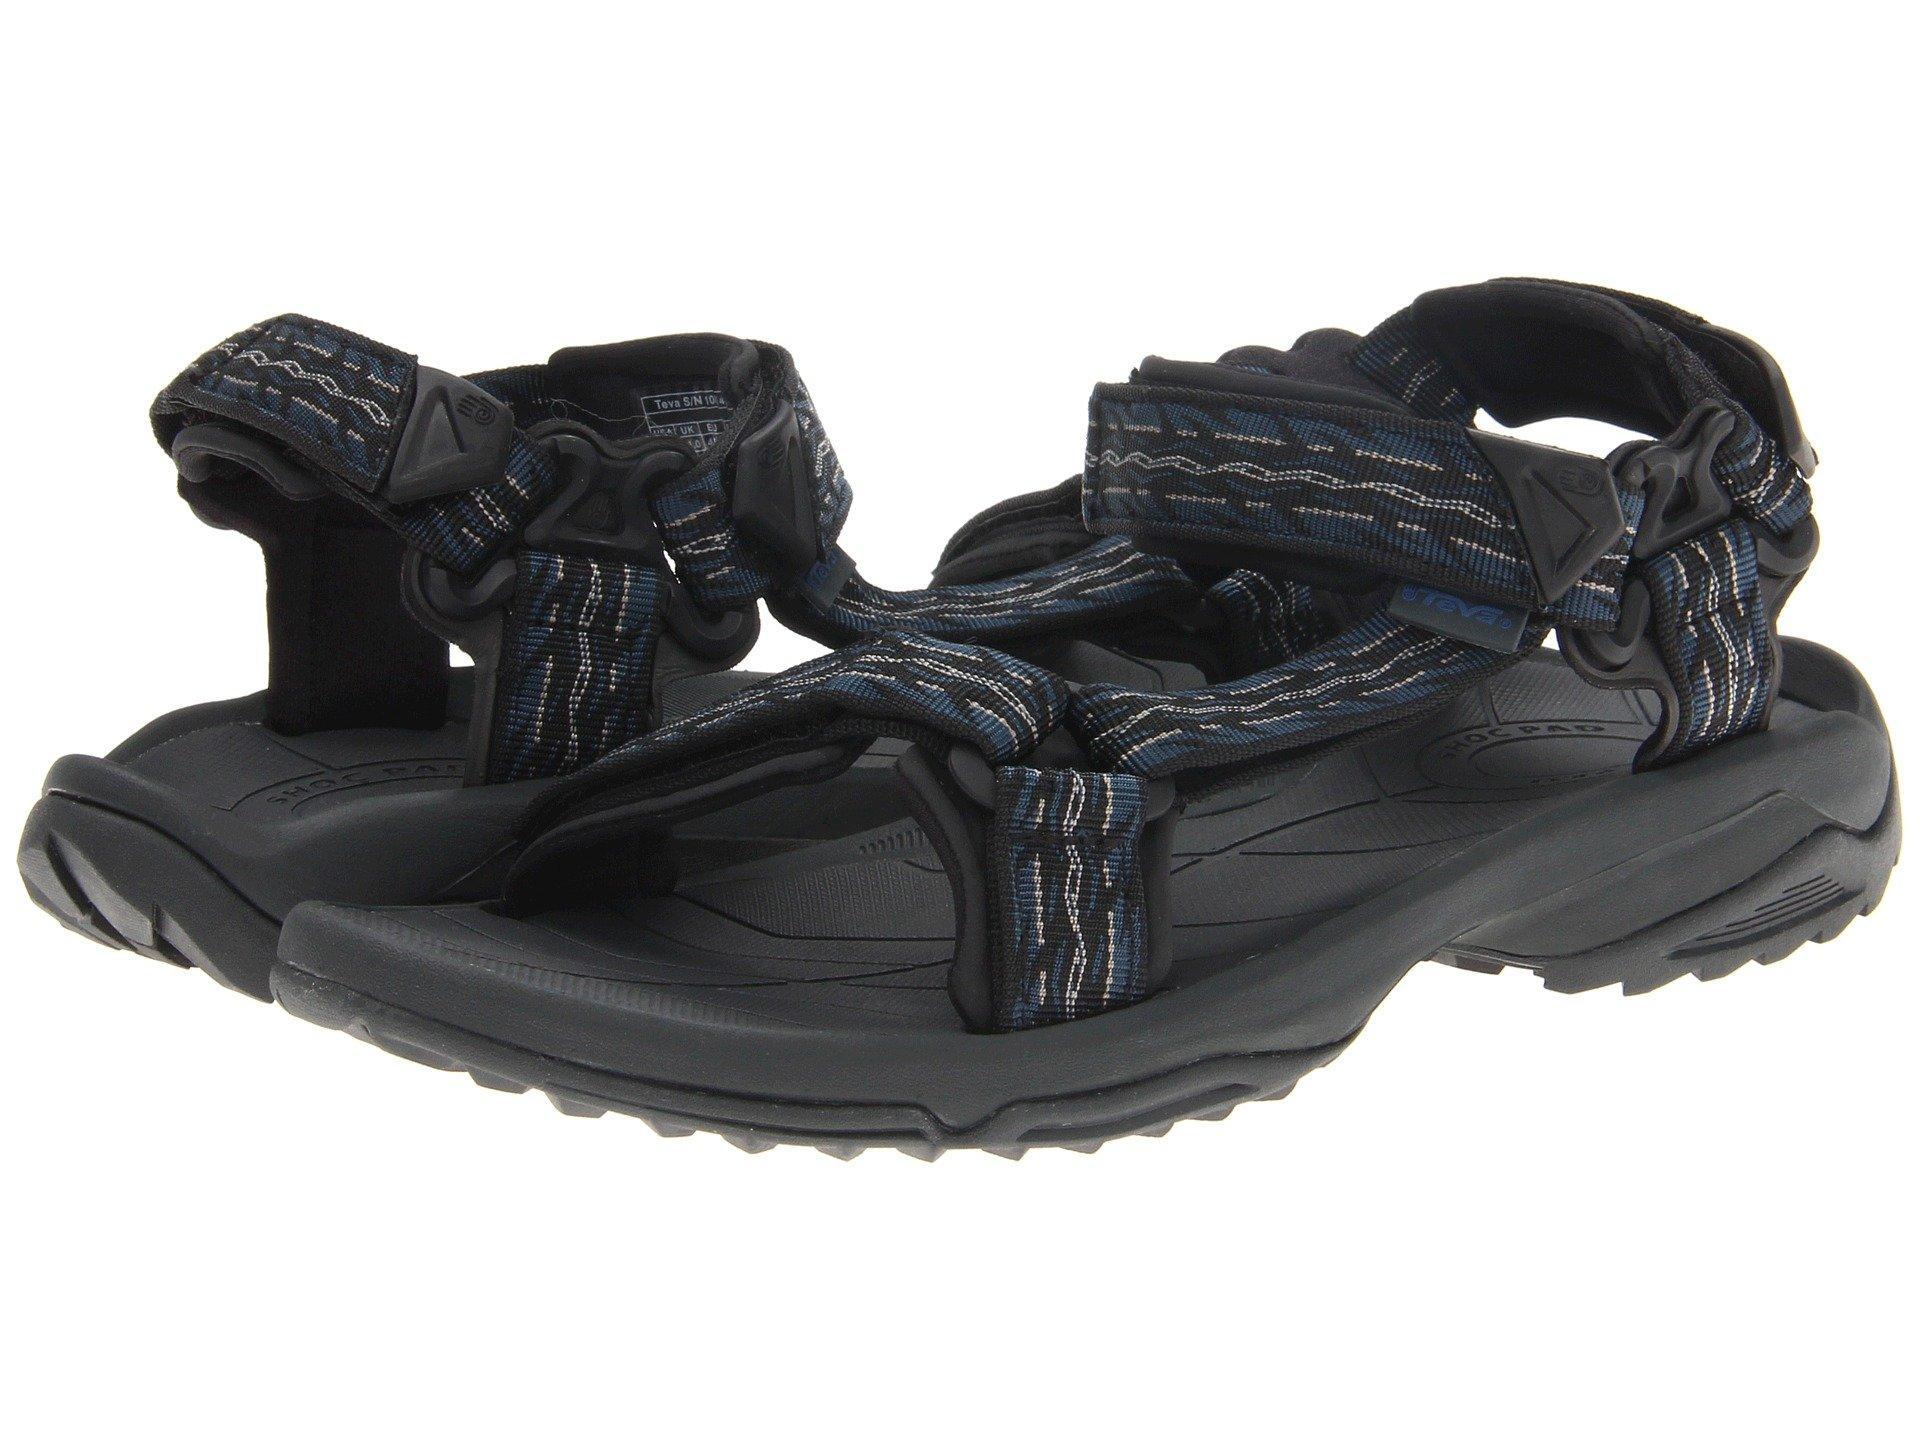 085c32ad0518 Teva Men s M Terra Fi 4 Water-Resistant Sandals Men s Shoes In Firetread  Midnight